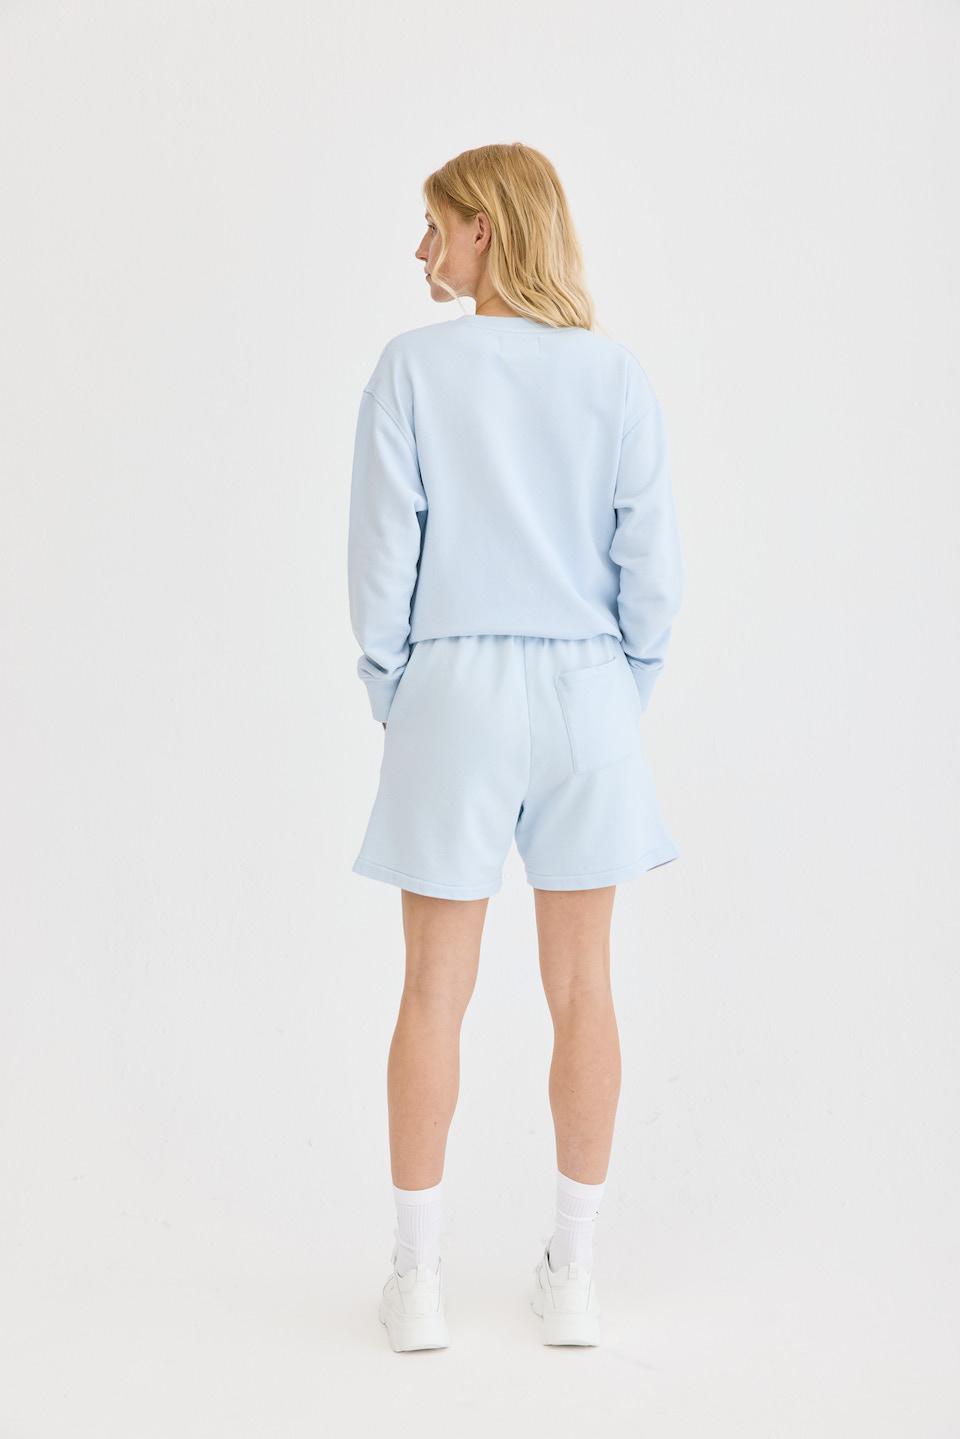 CPH Shorts 1 org. cotton light blue - alternative 2